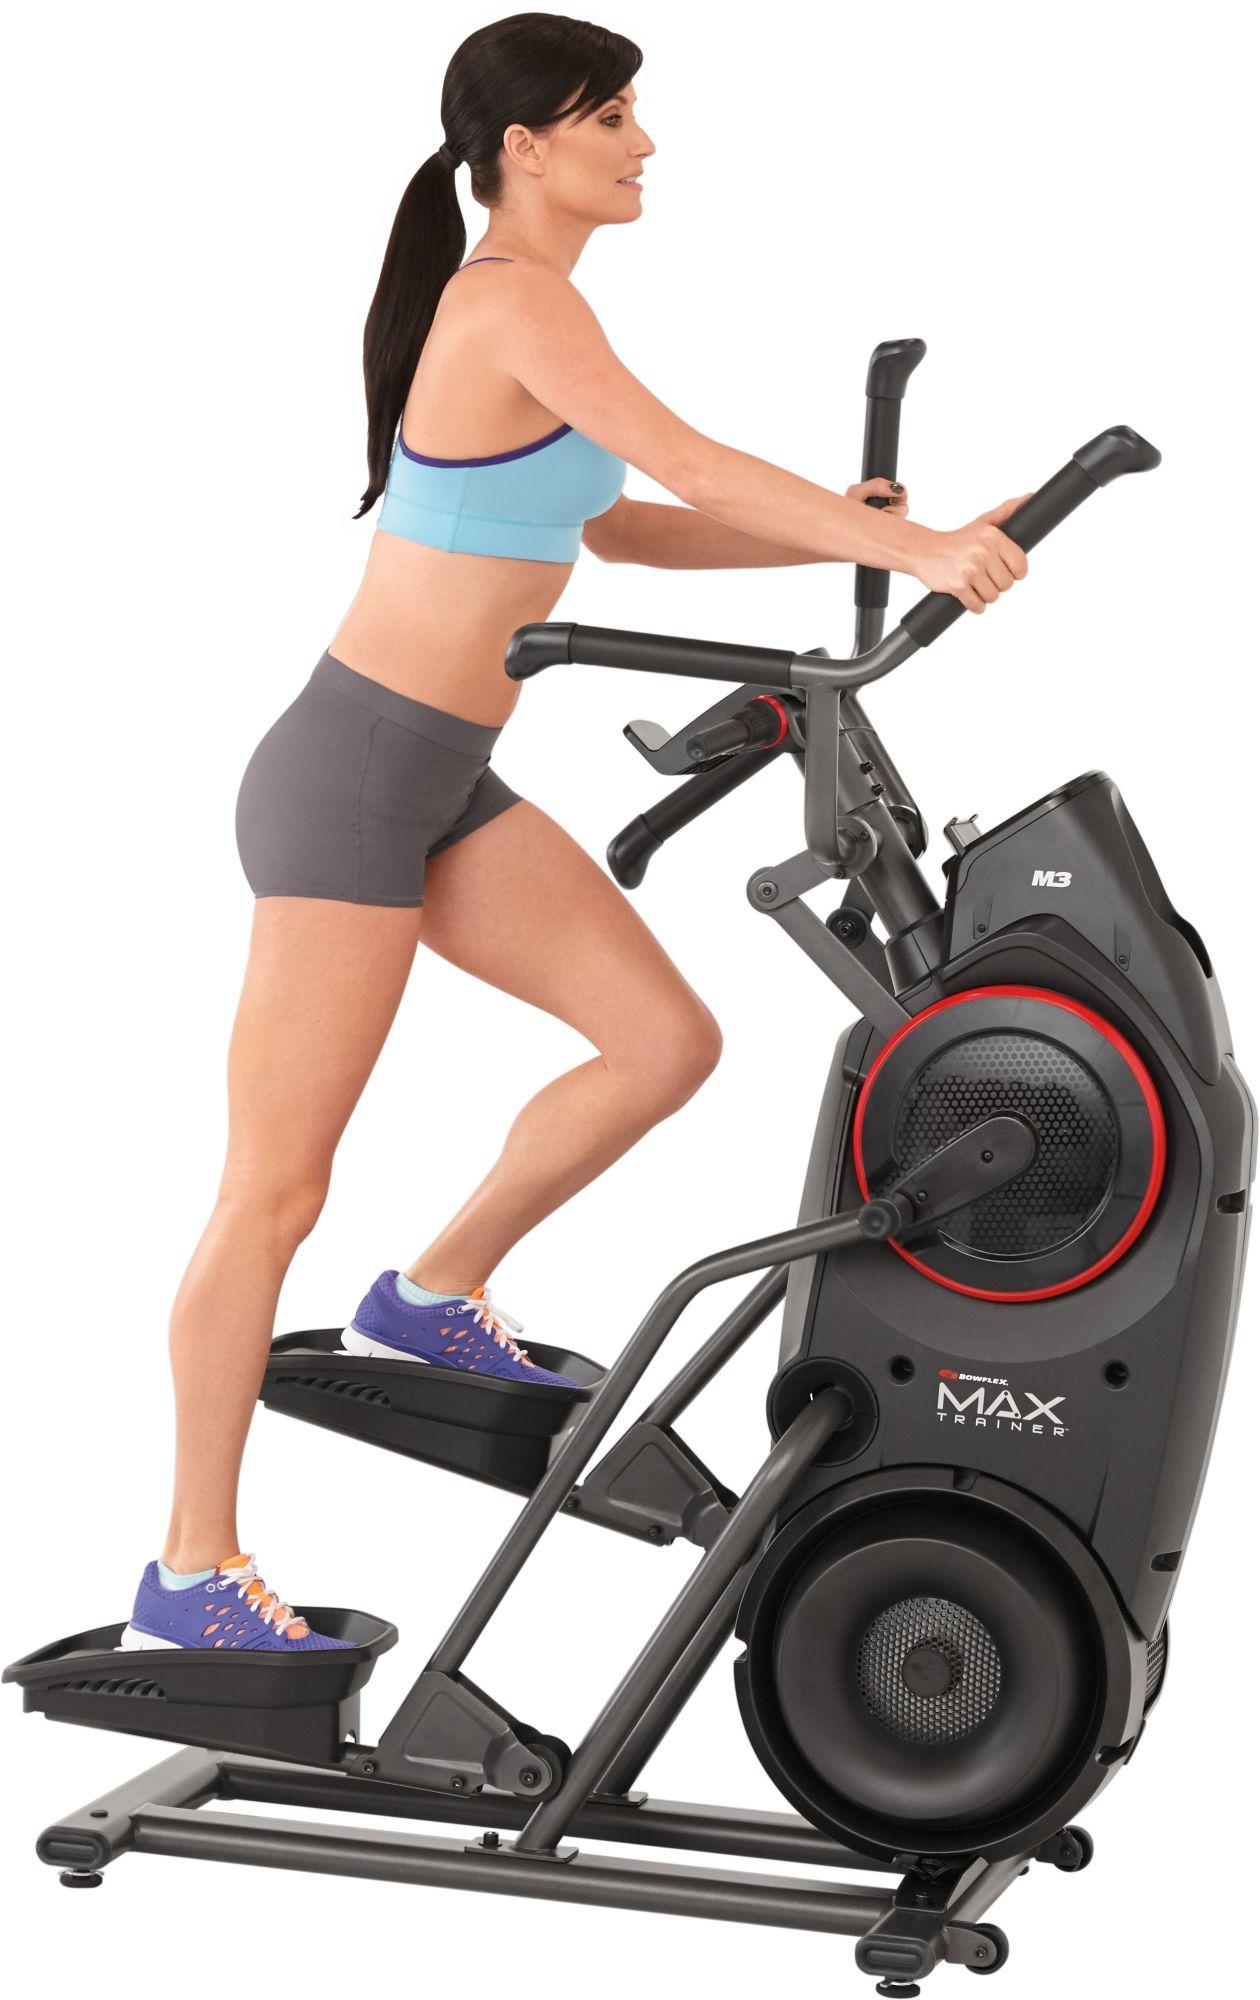 bowflex m3 max trainer dicks sporting goods